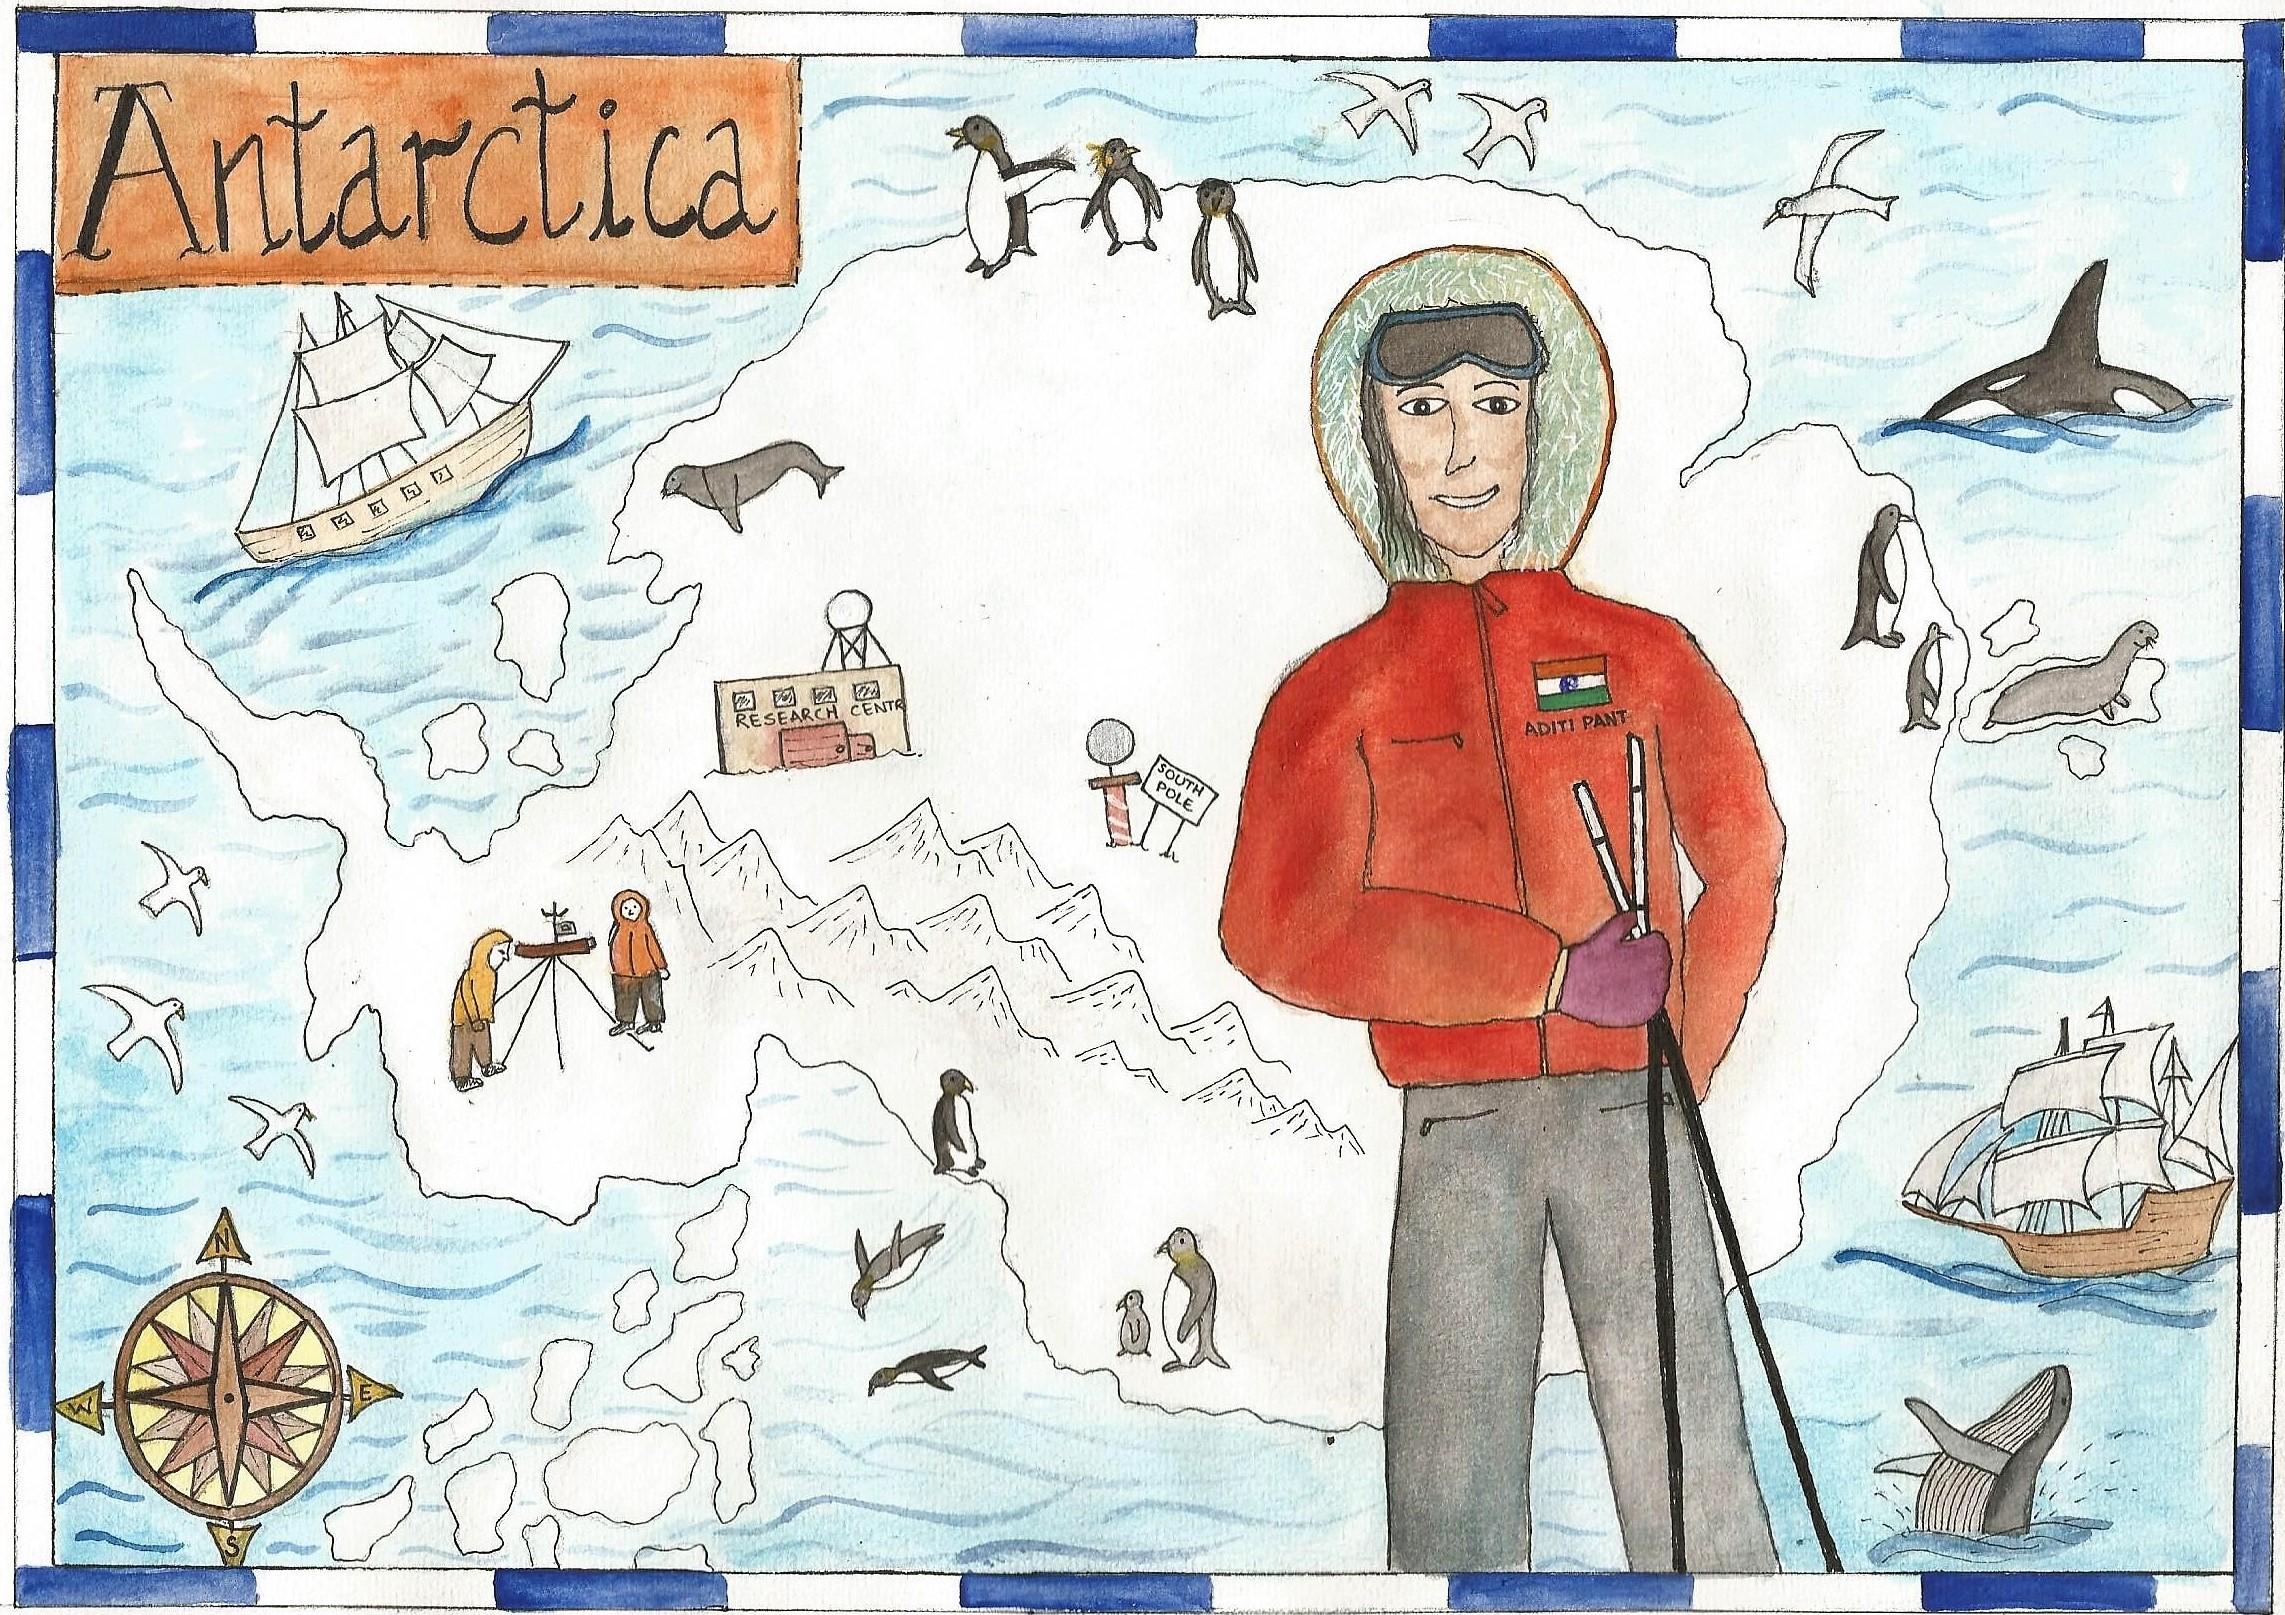 The Antarctic Explorer